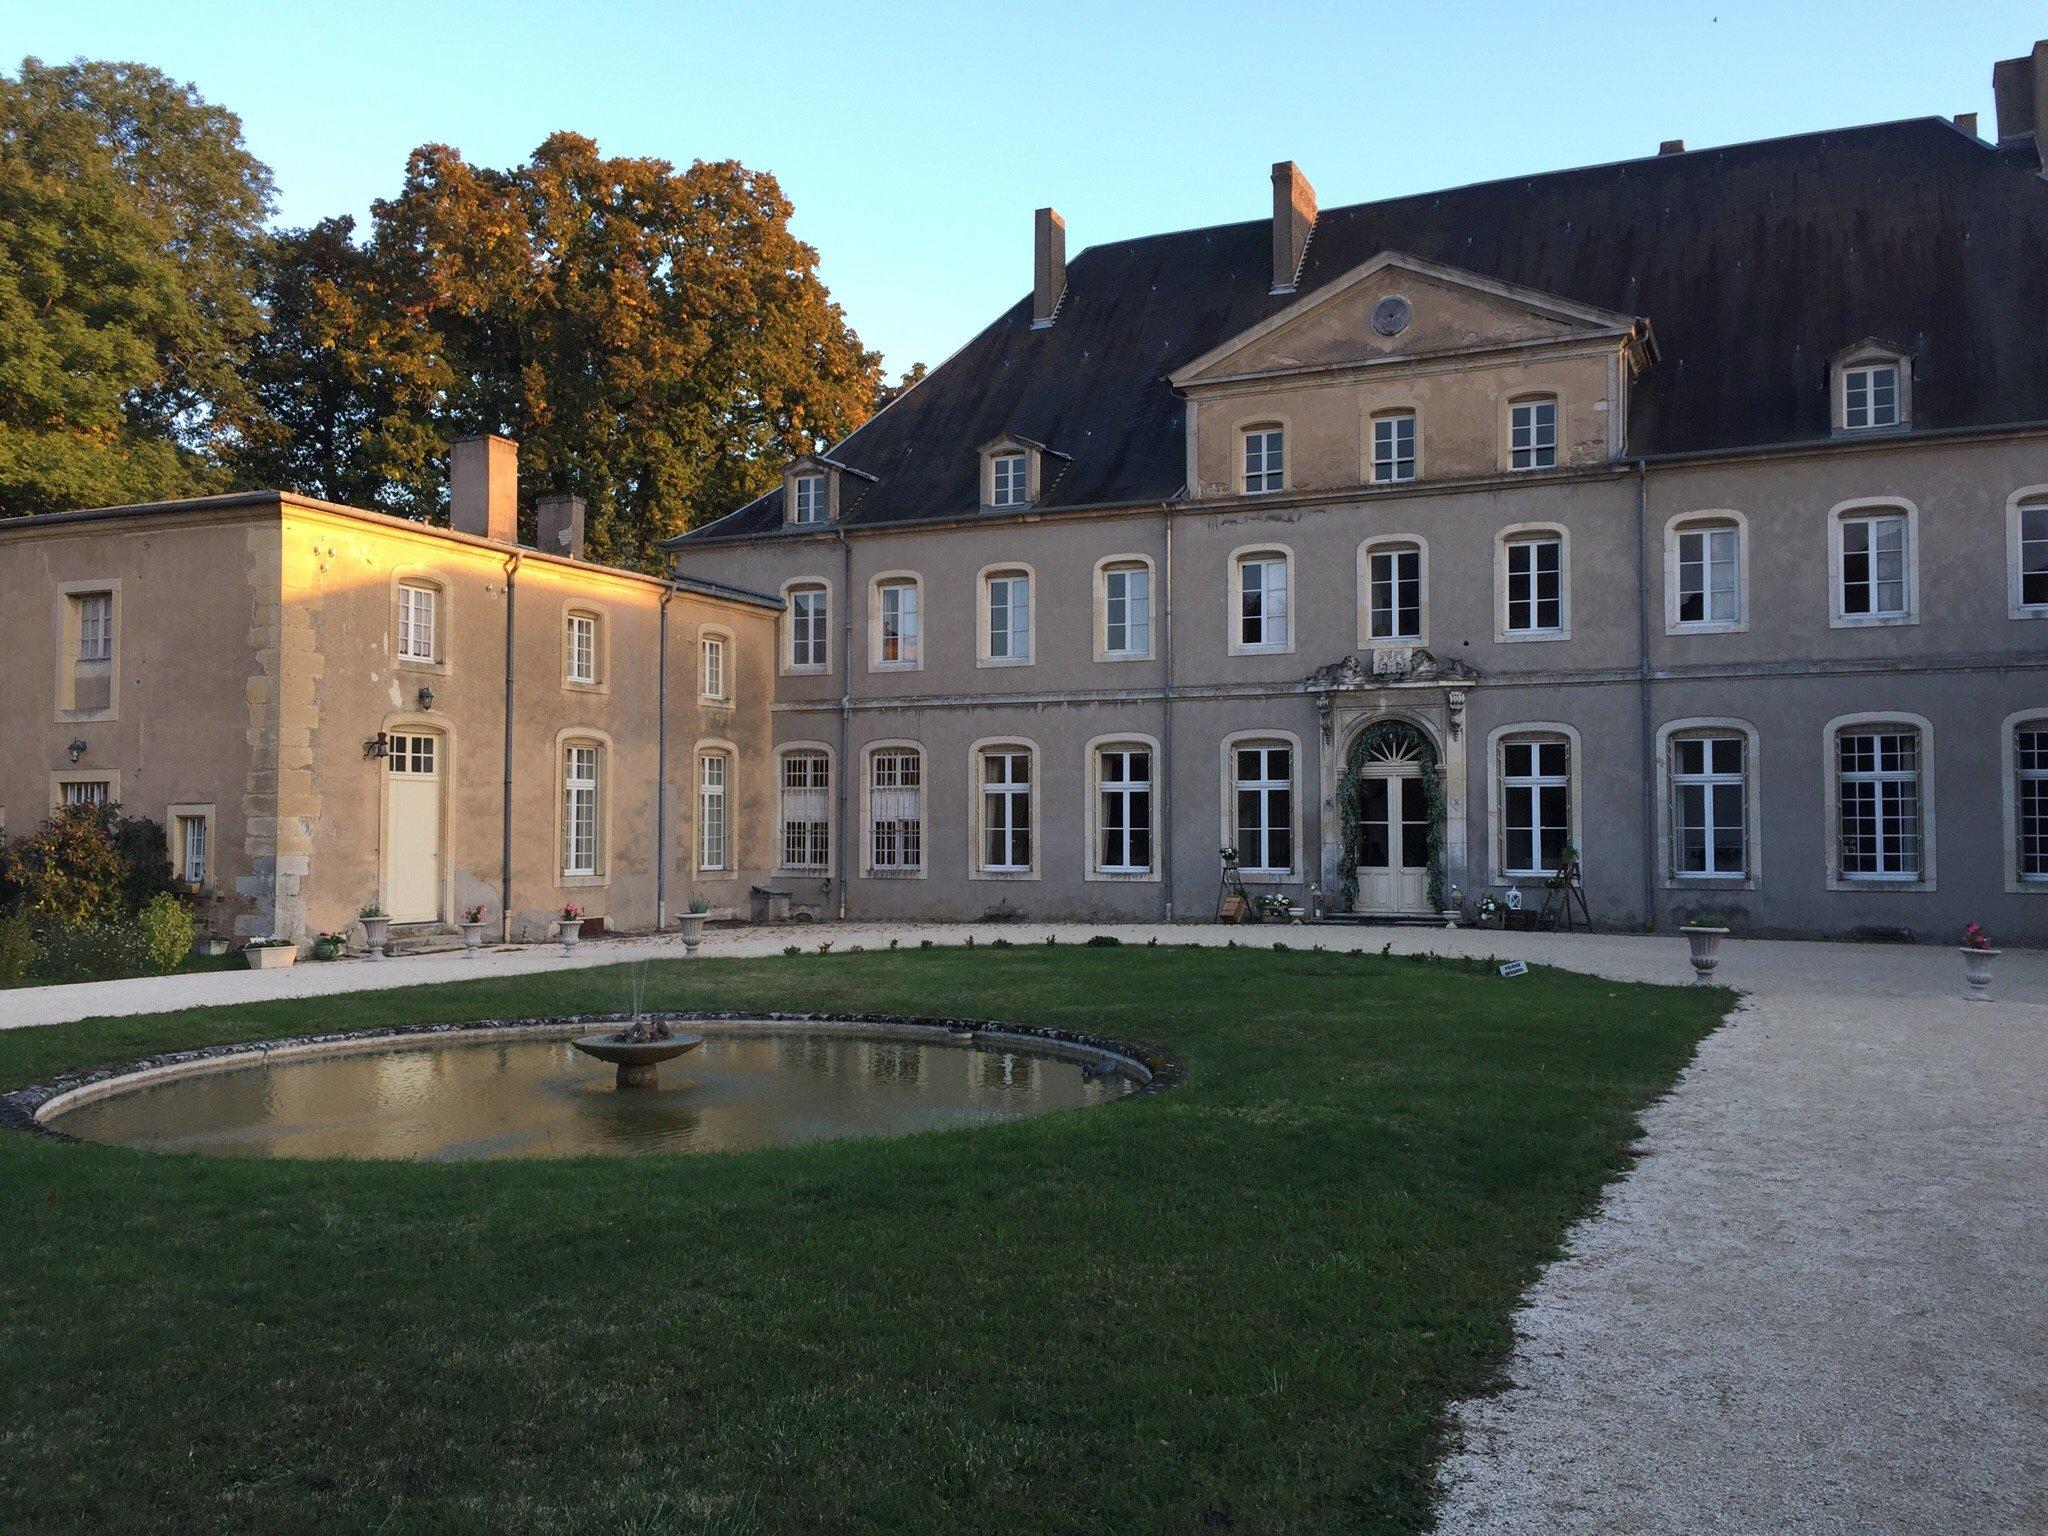 Chateau de Saulxures